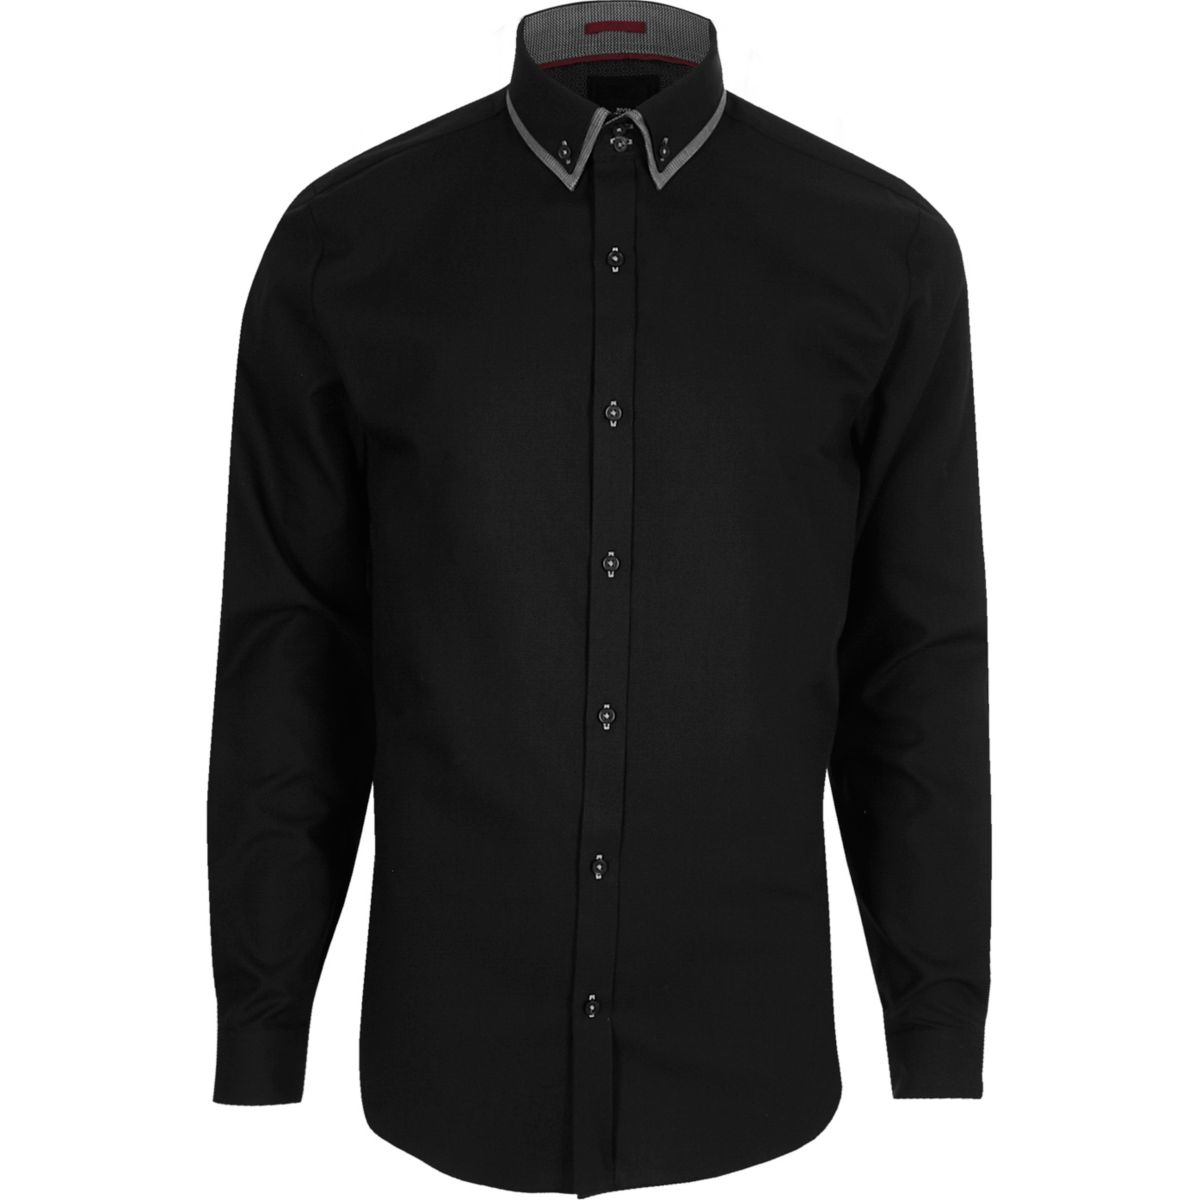 Black double collar slim fit smart shirt